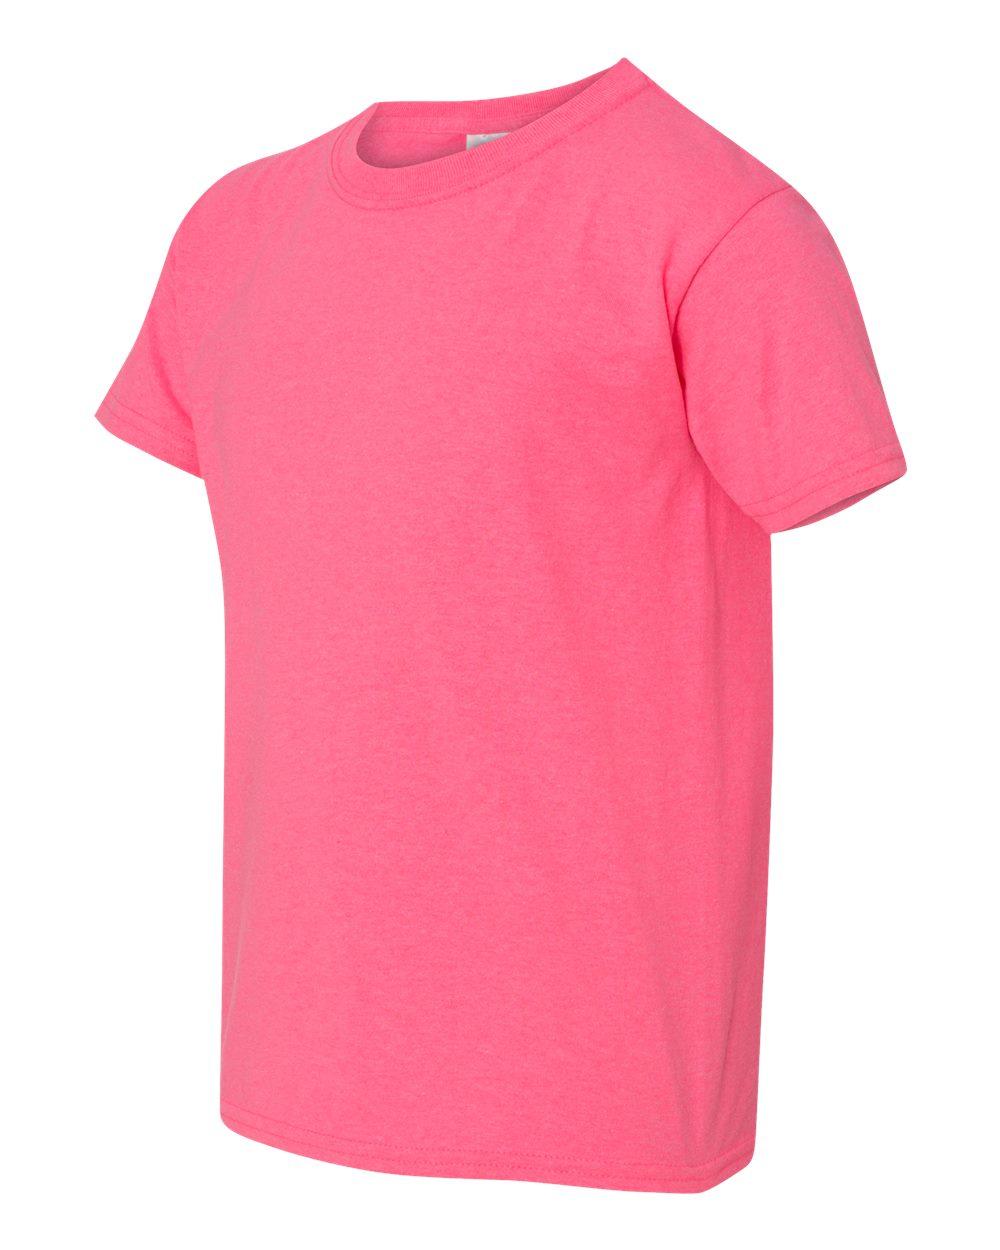 Gildan 5000b heavy cotton youth t shirt friendly for Gildan t shirt printing